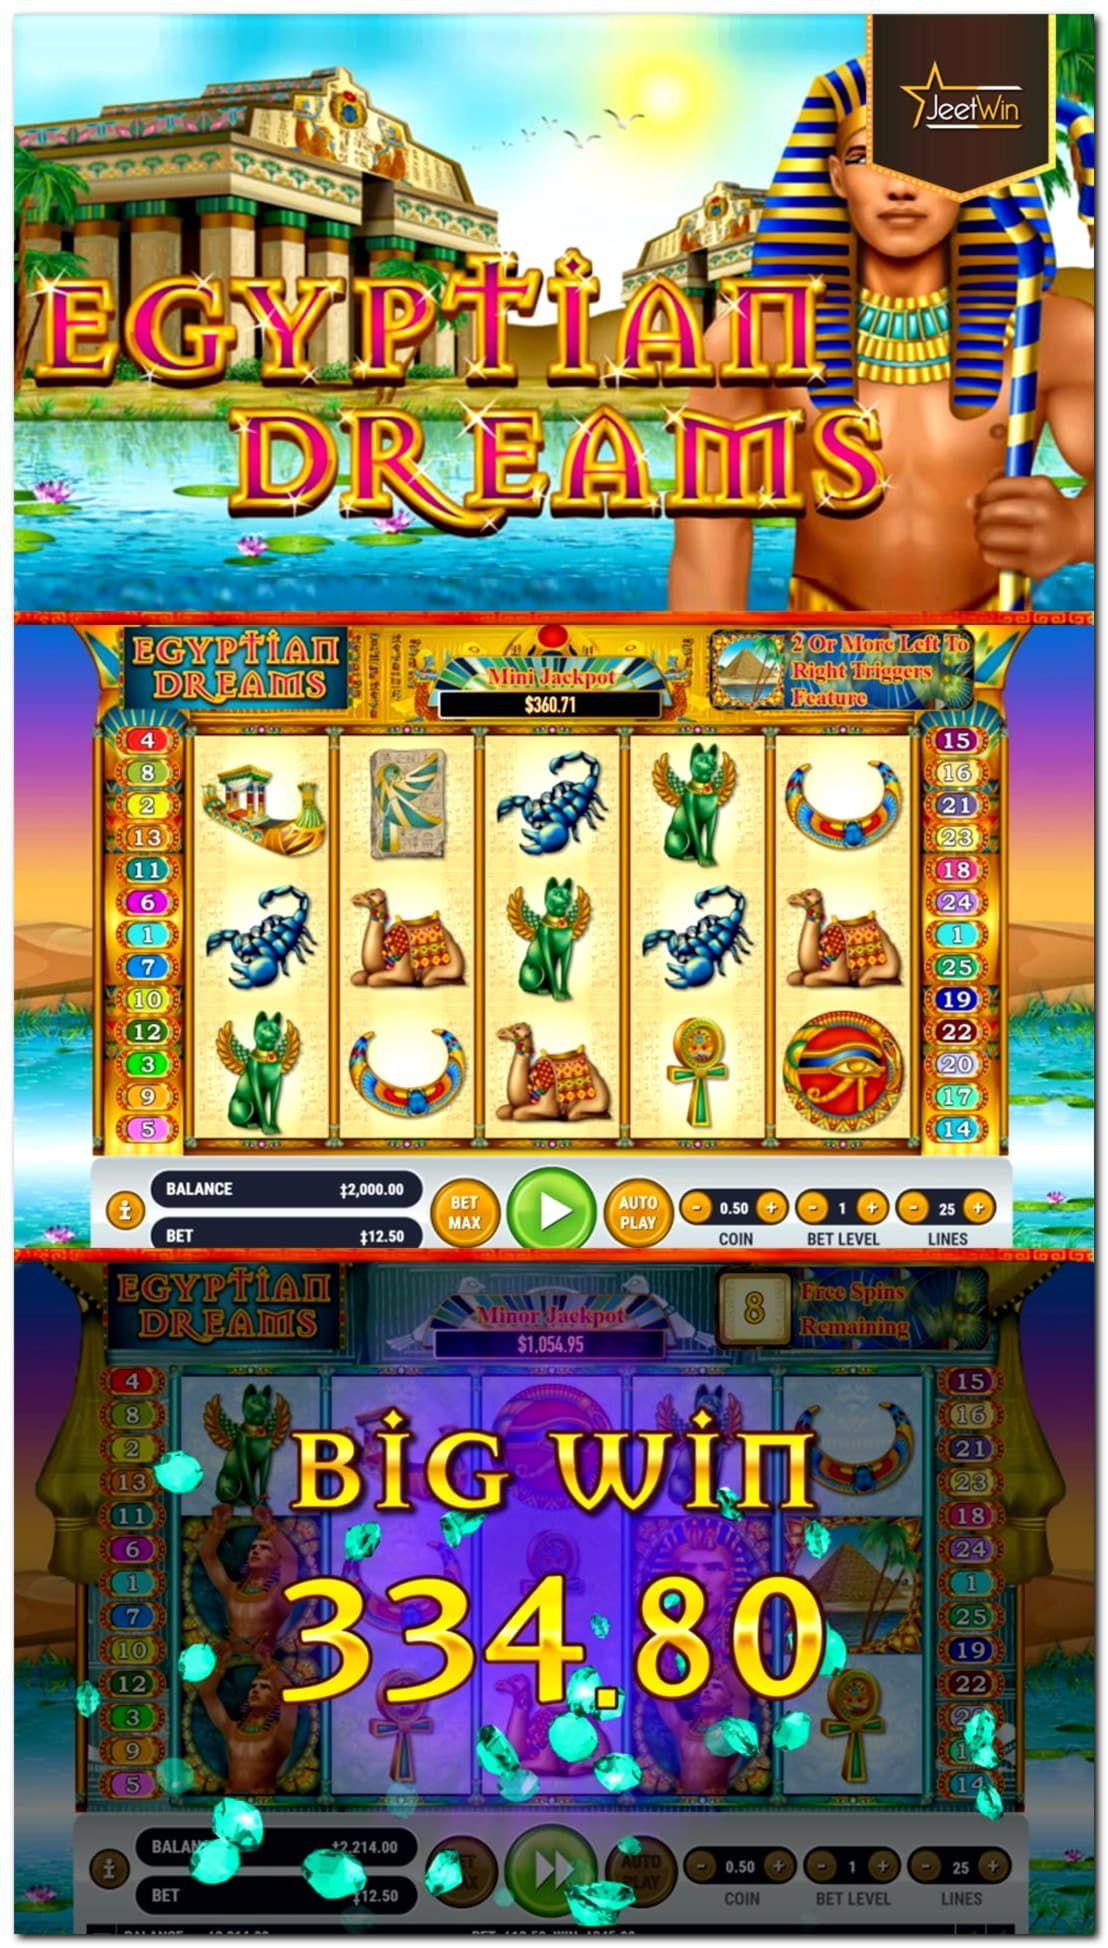 Online Casino Games With No Deposit